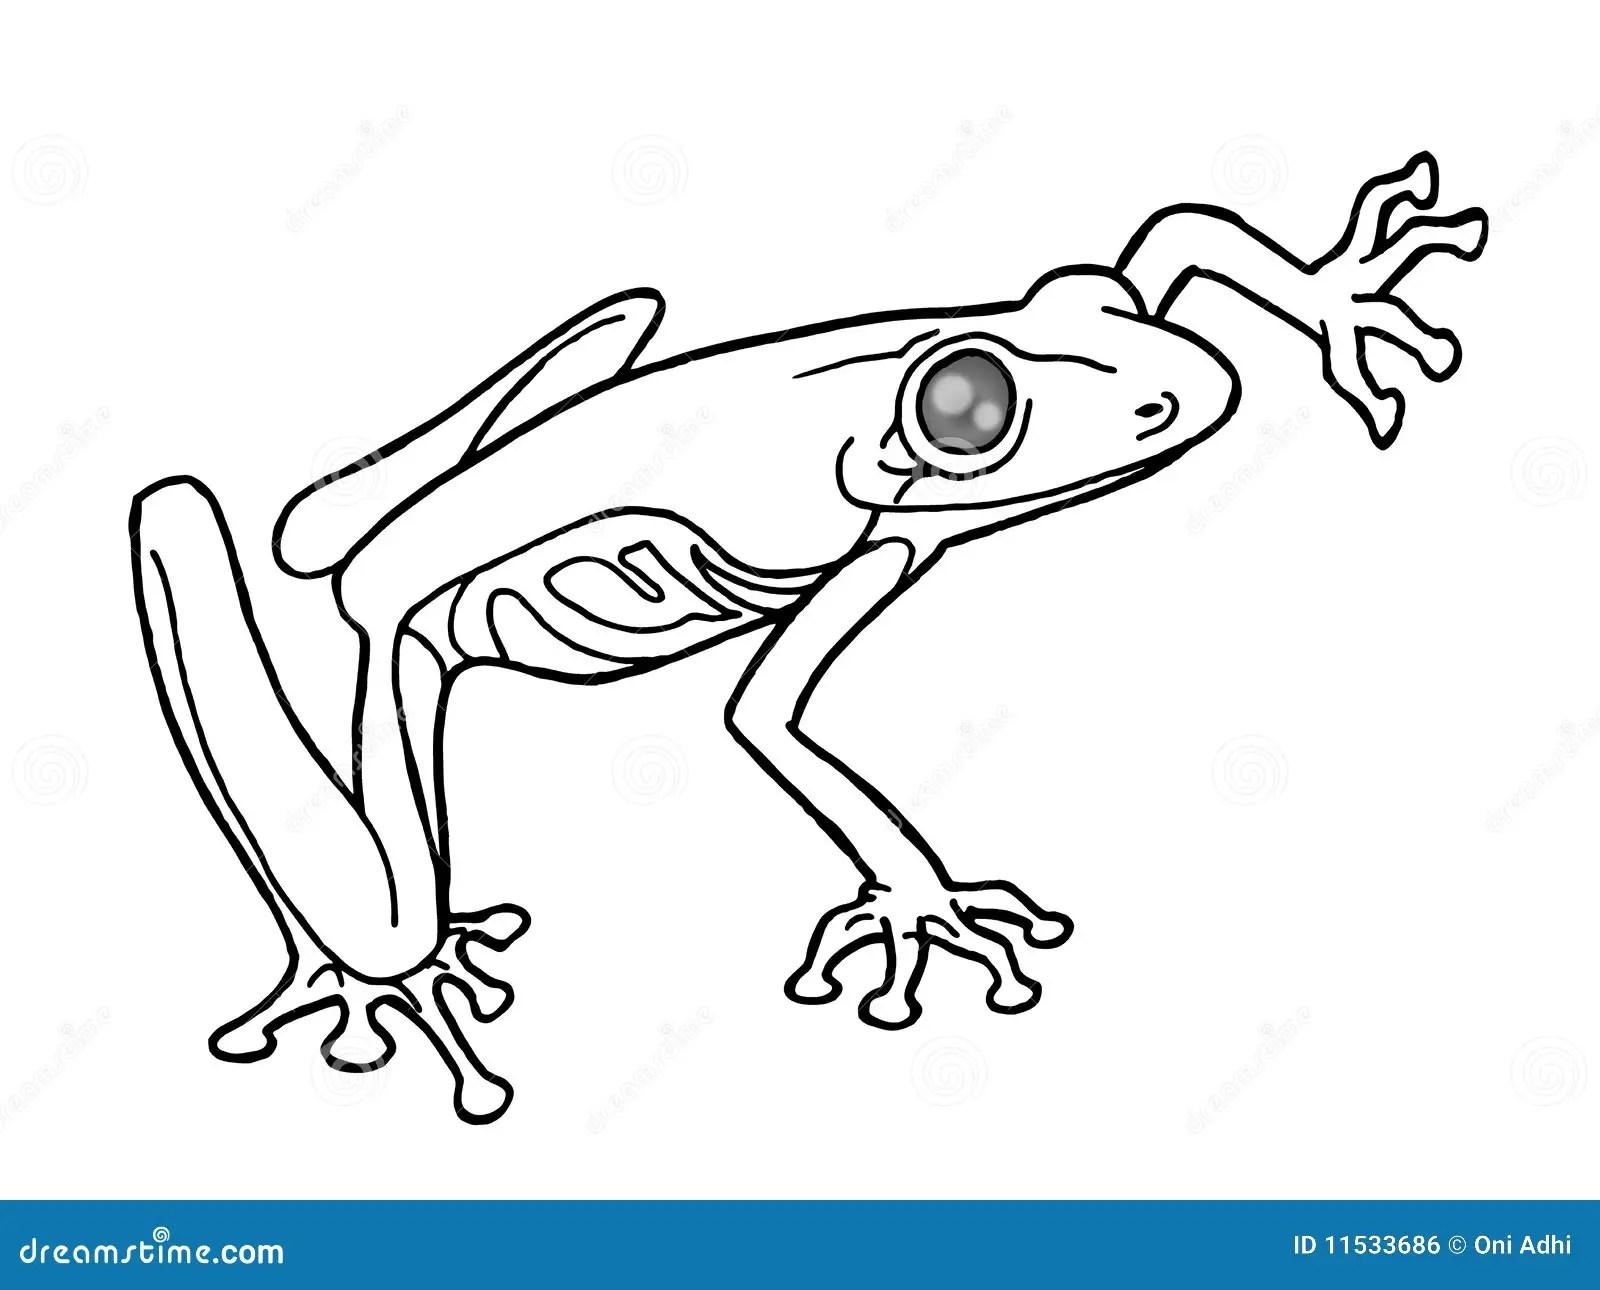 Black and white frog stock illustration. Illustration of